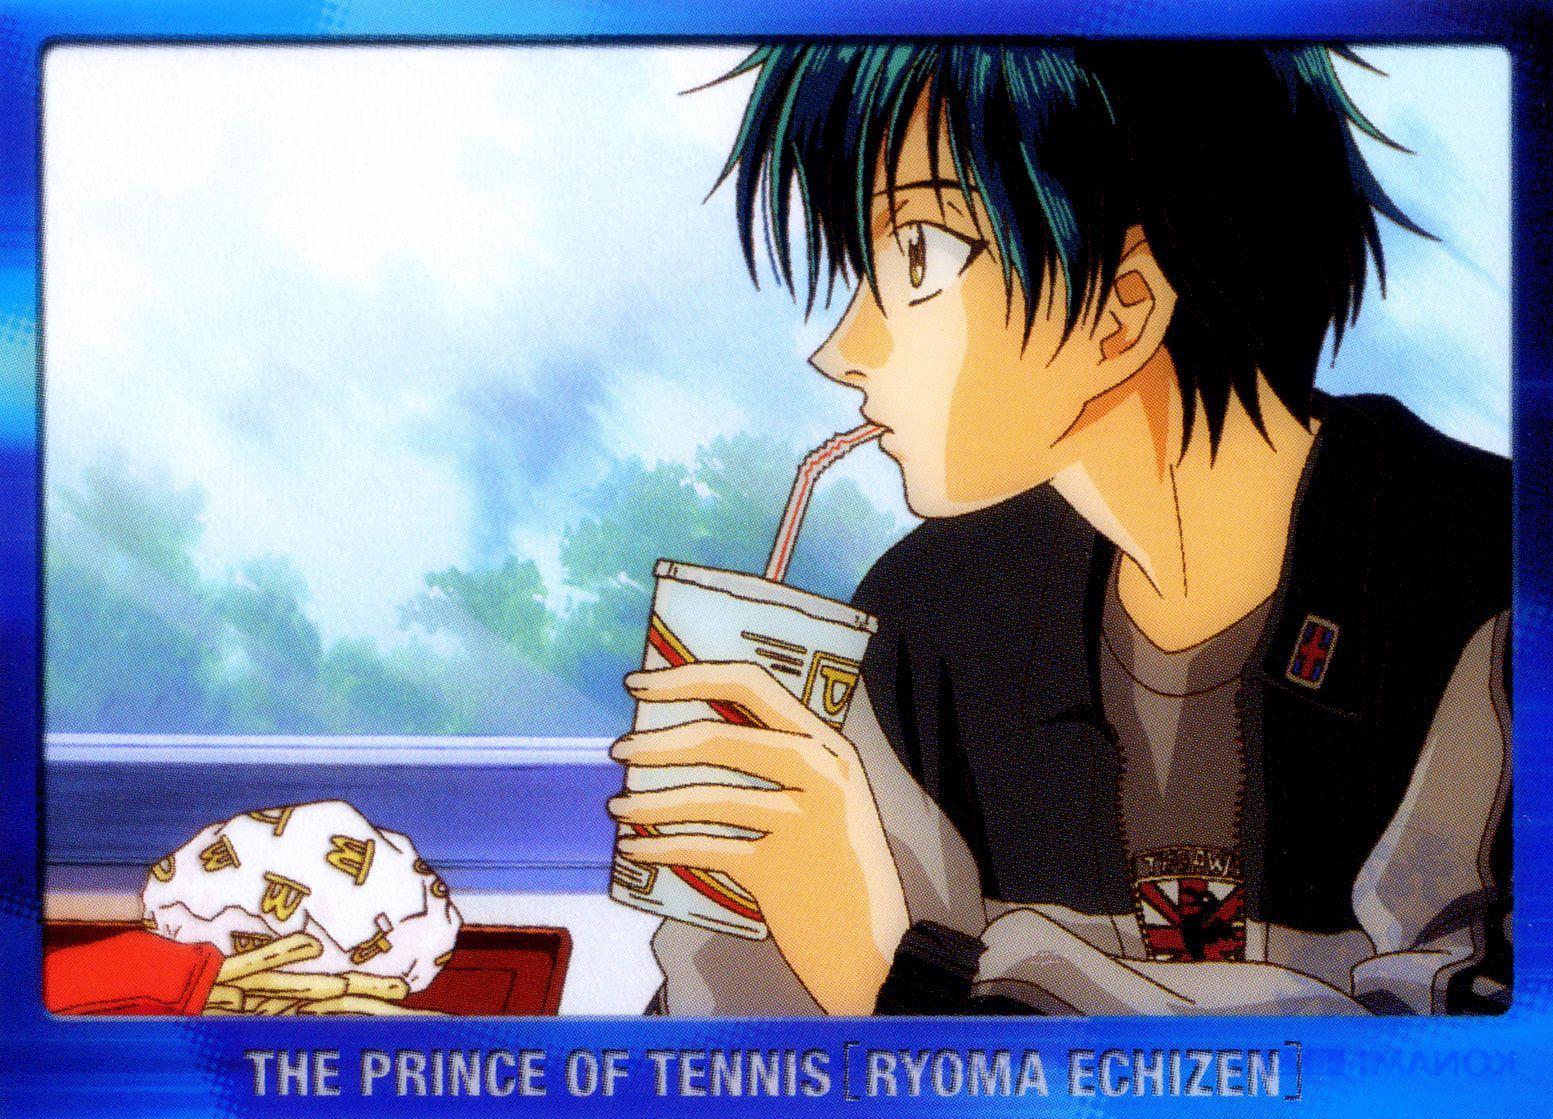 PRINCE OF TENNIS SeriesGames 越前リョーマ, テニプリ, テニスの王子様